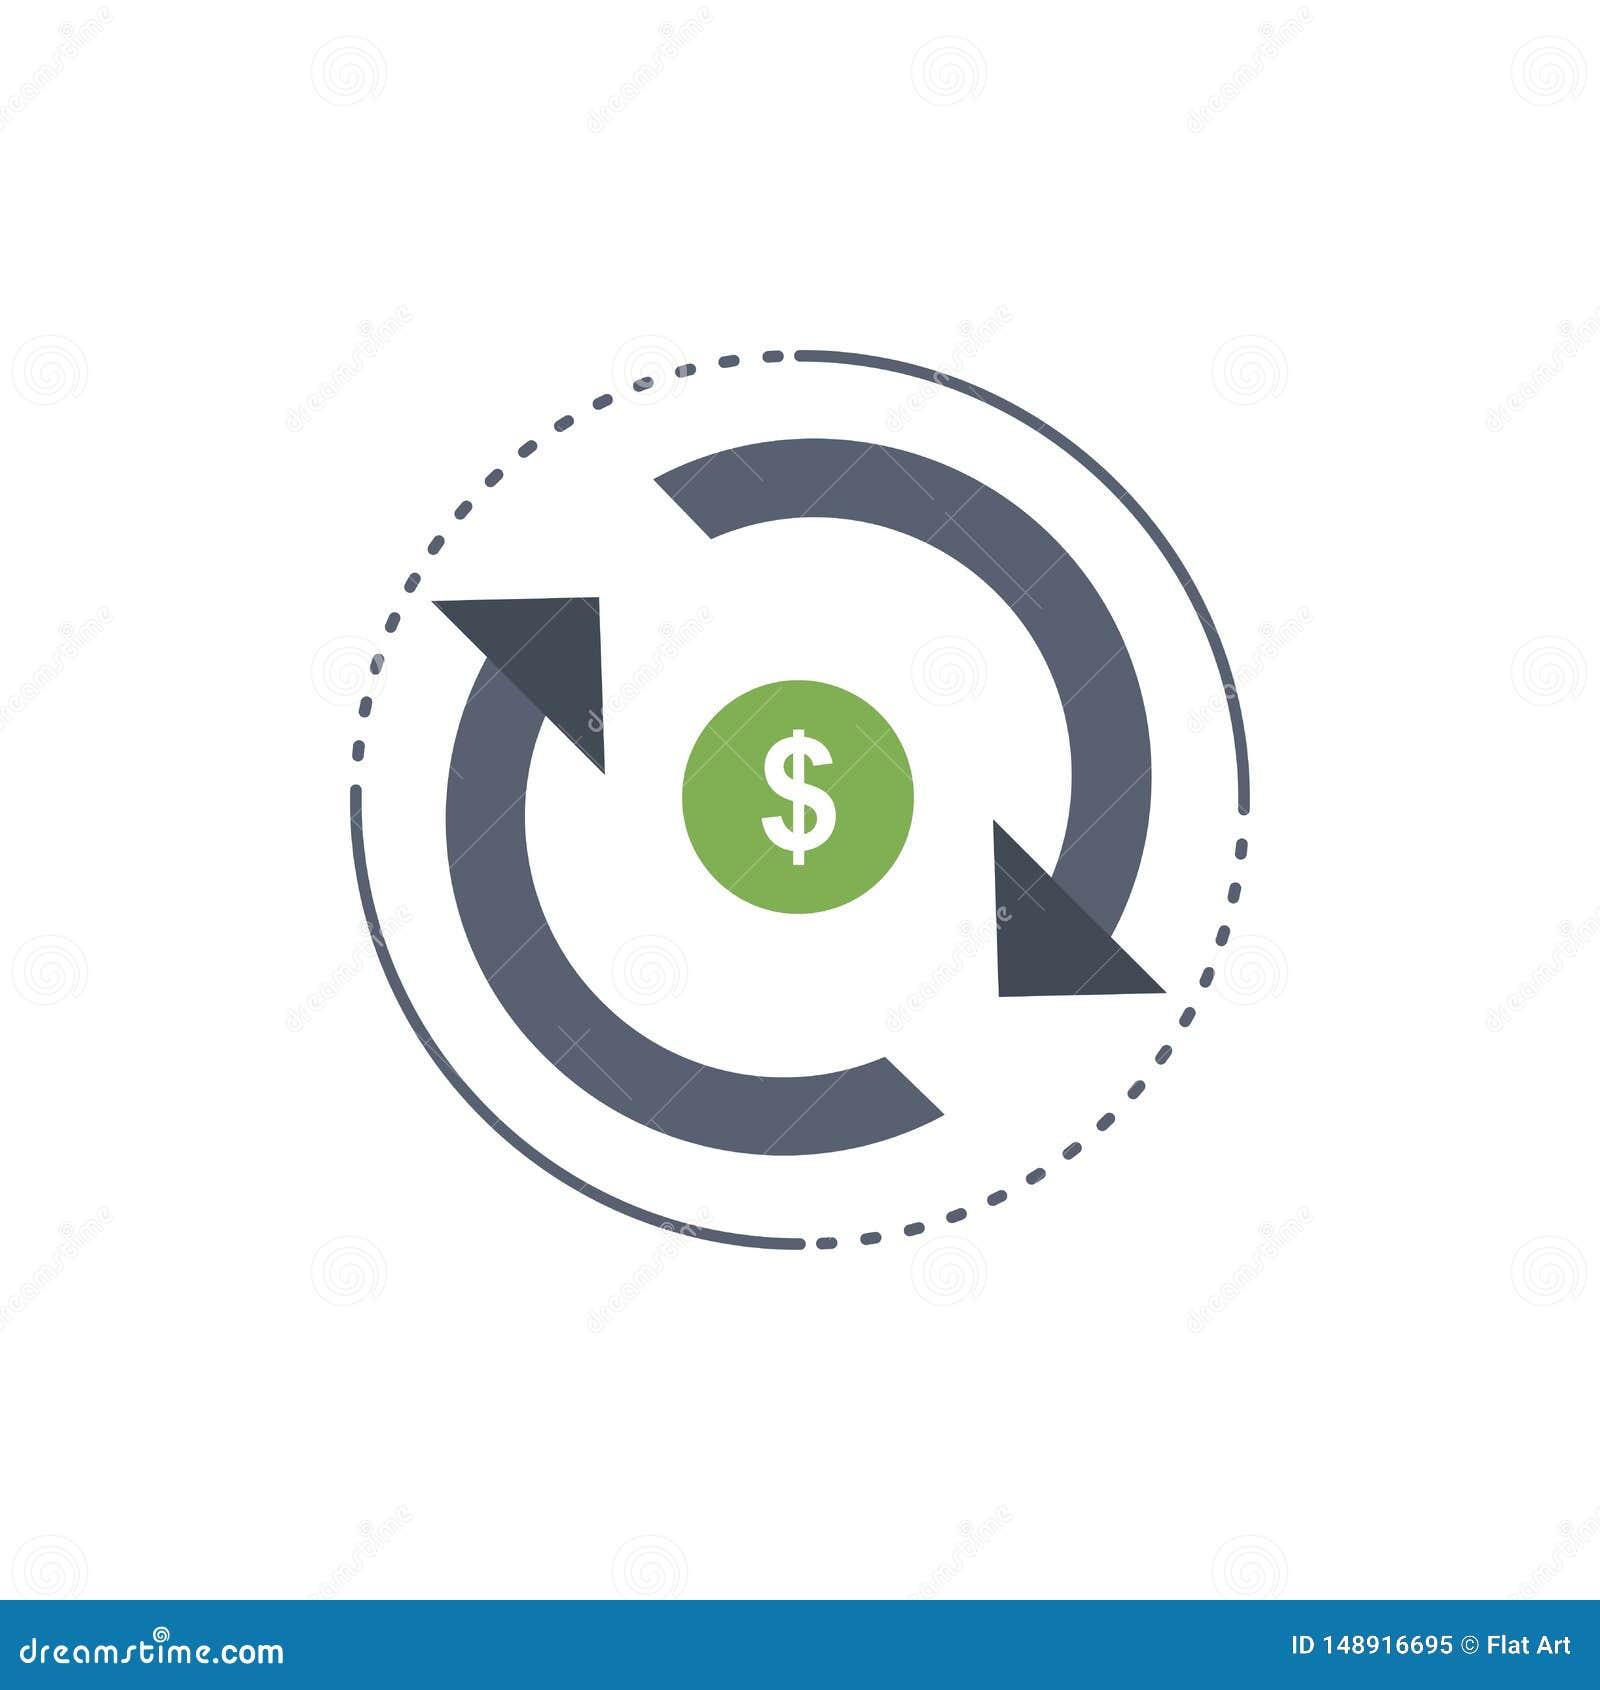 Zirkulation, Finanzierung, Fluss, Markt, Geld flacher Farbikonen-Vektor